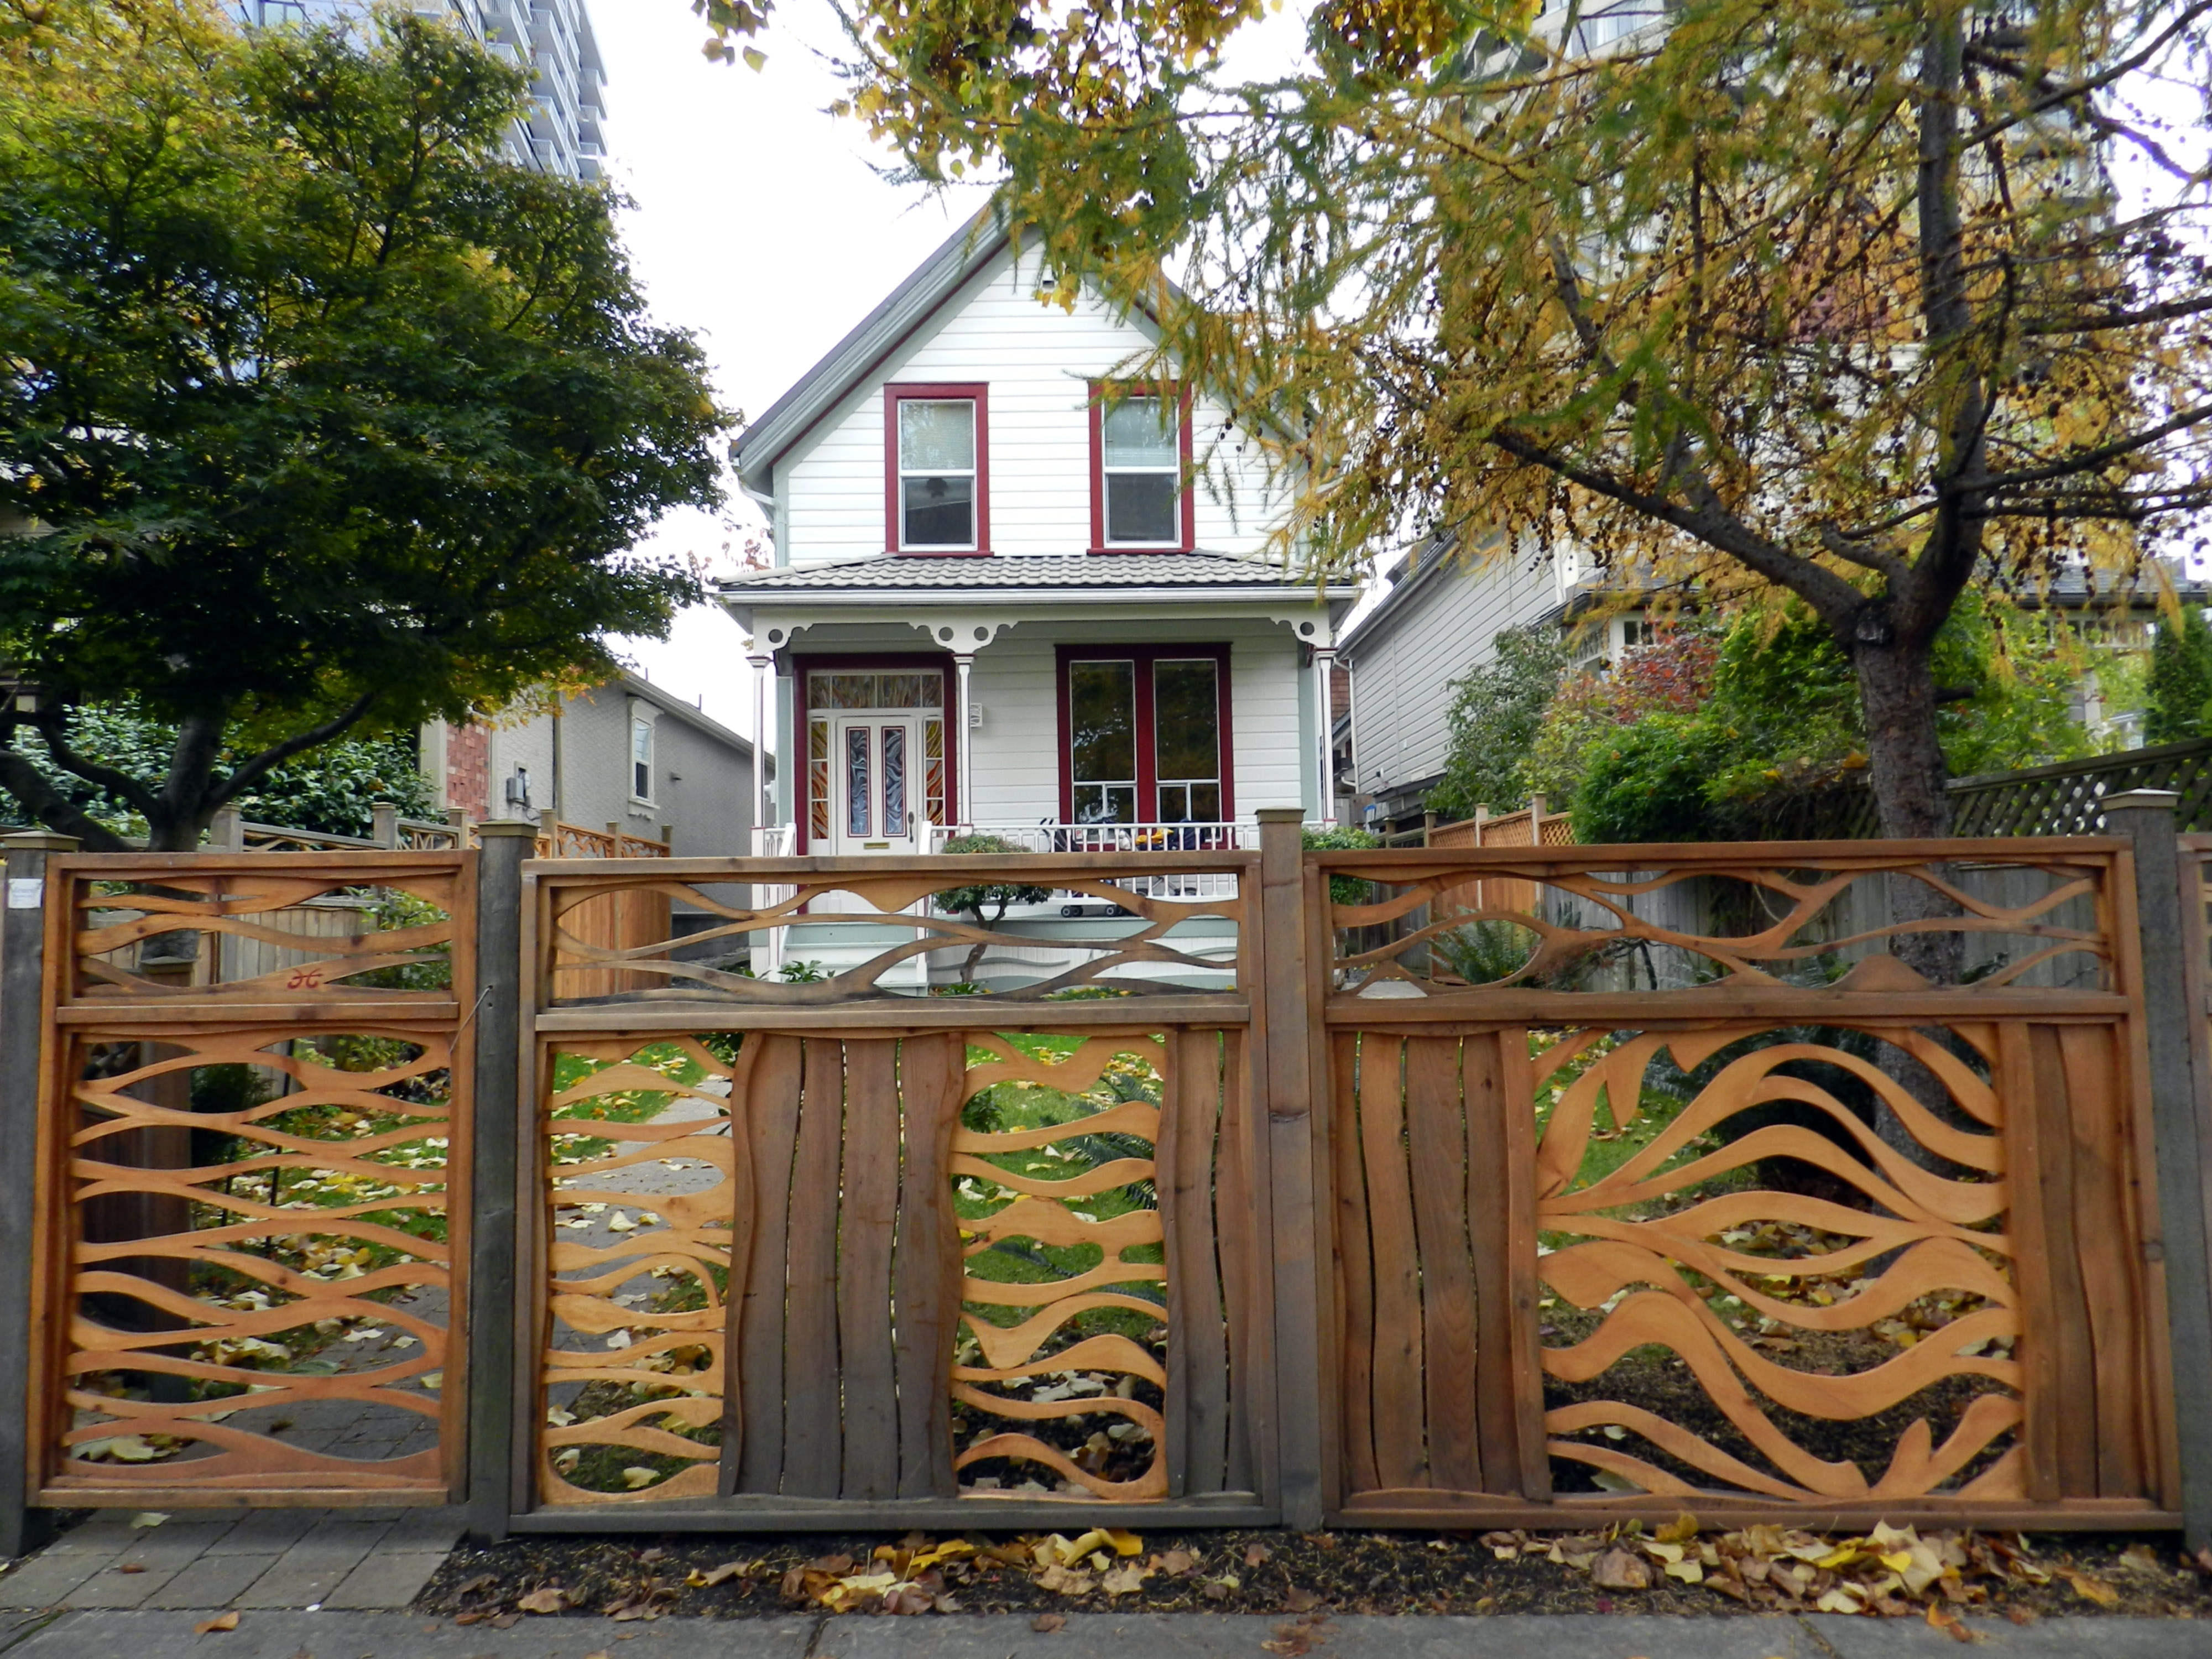 Wooden garden gates for sale - Sometime